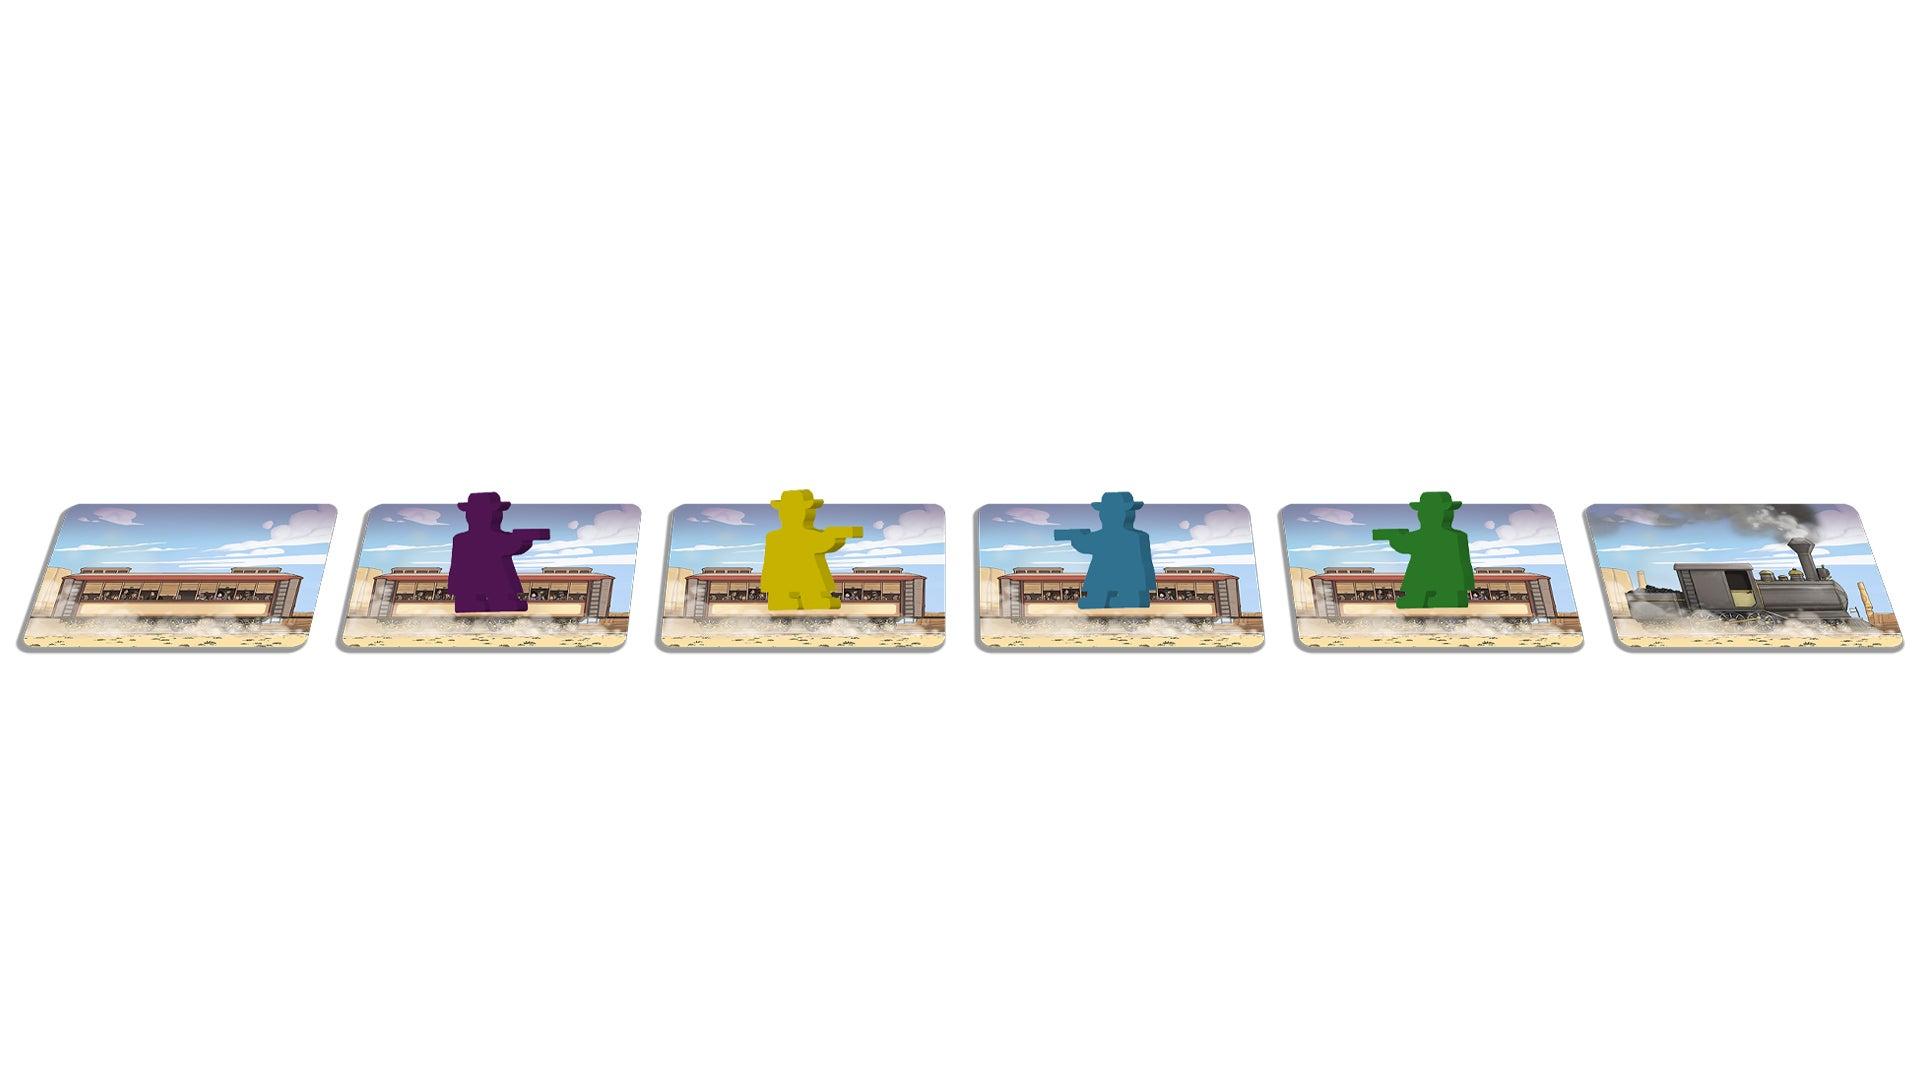 Super Colt Express board game card layout